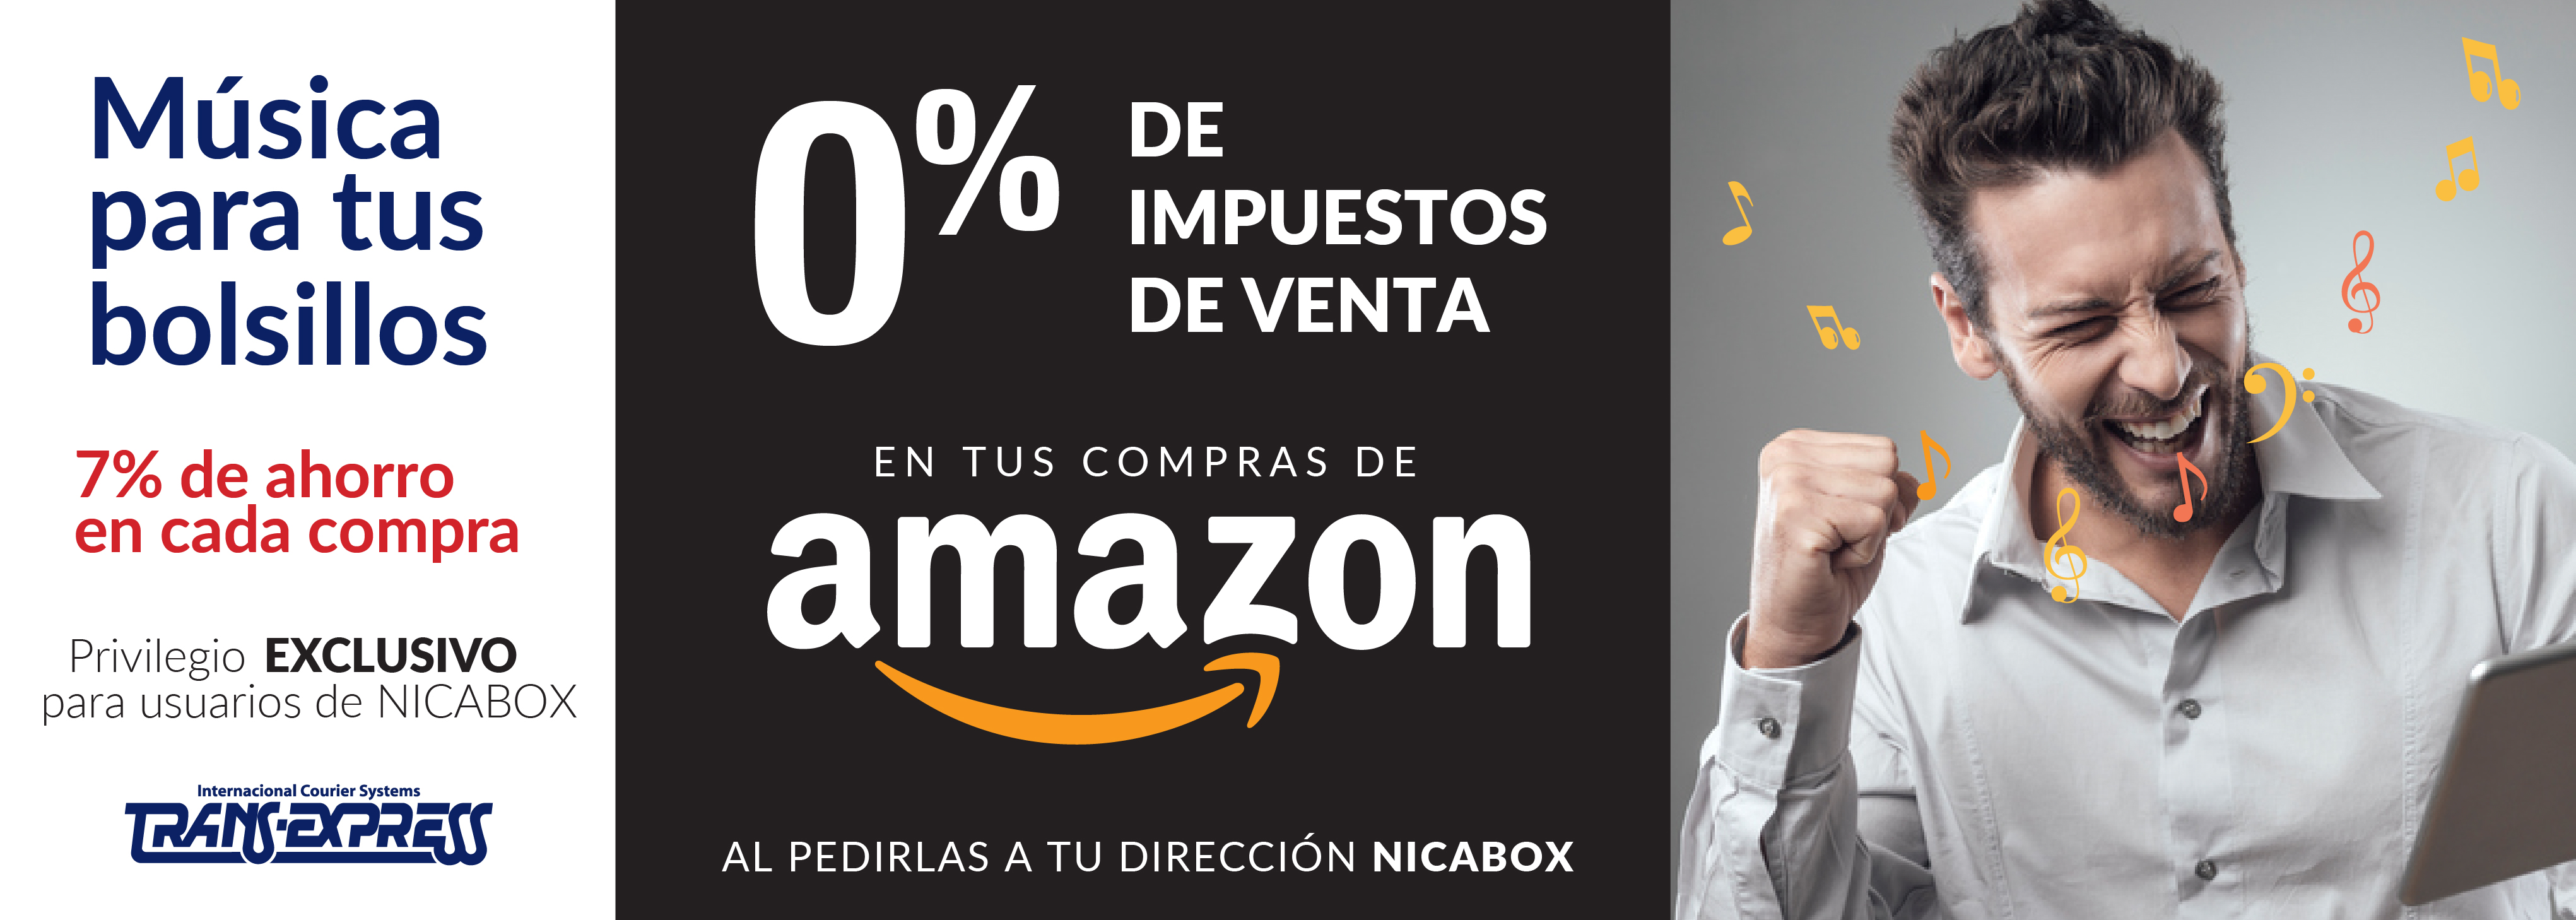 lNicabox-03